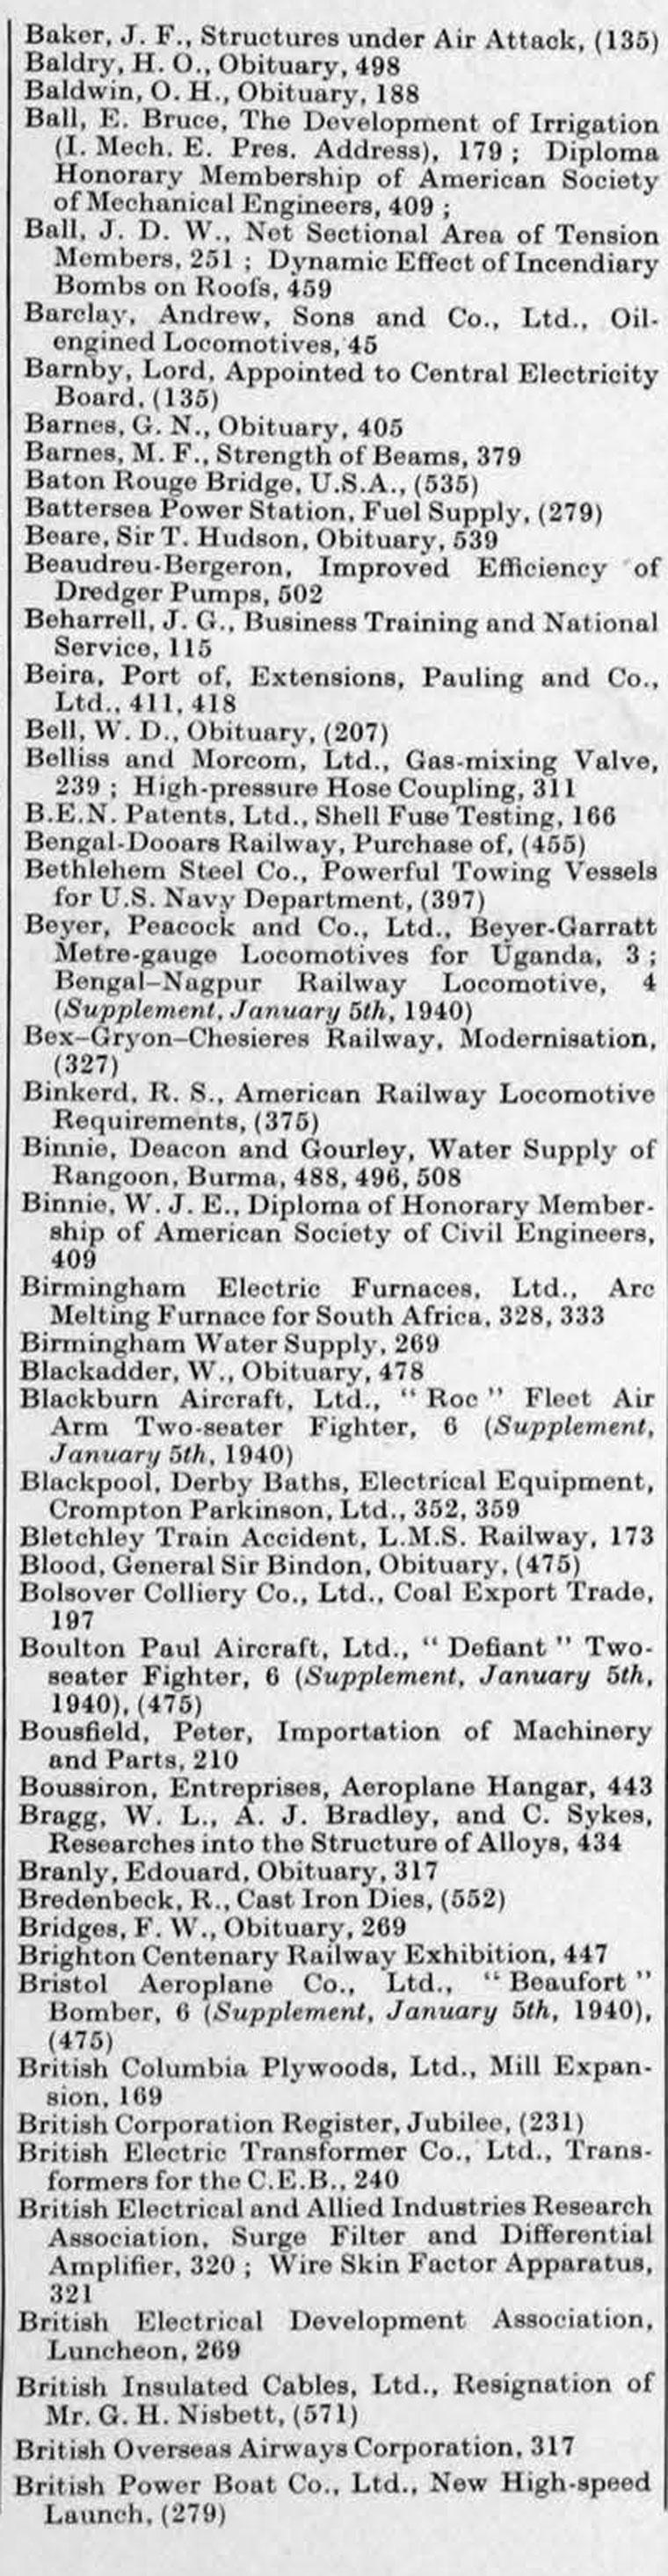 The Engineer 1940 Jan Jun Index